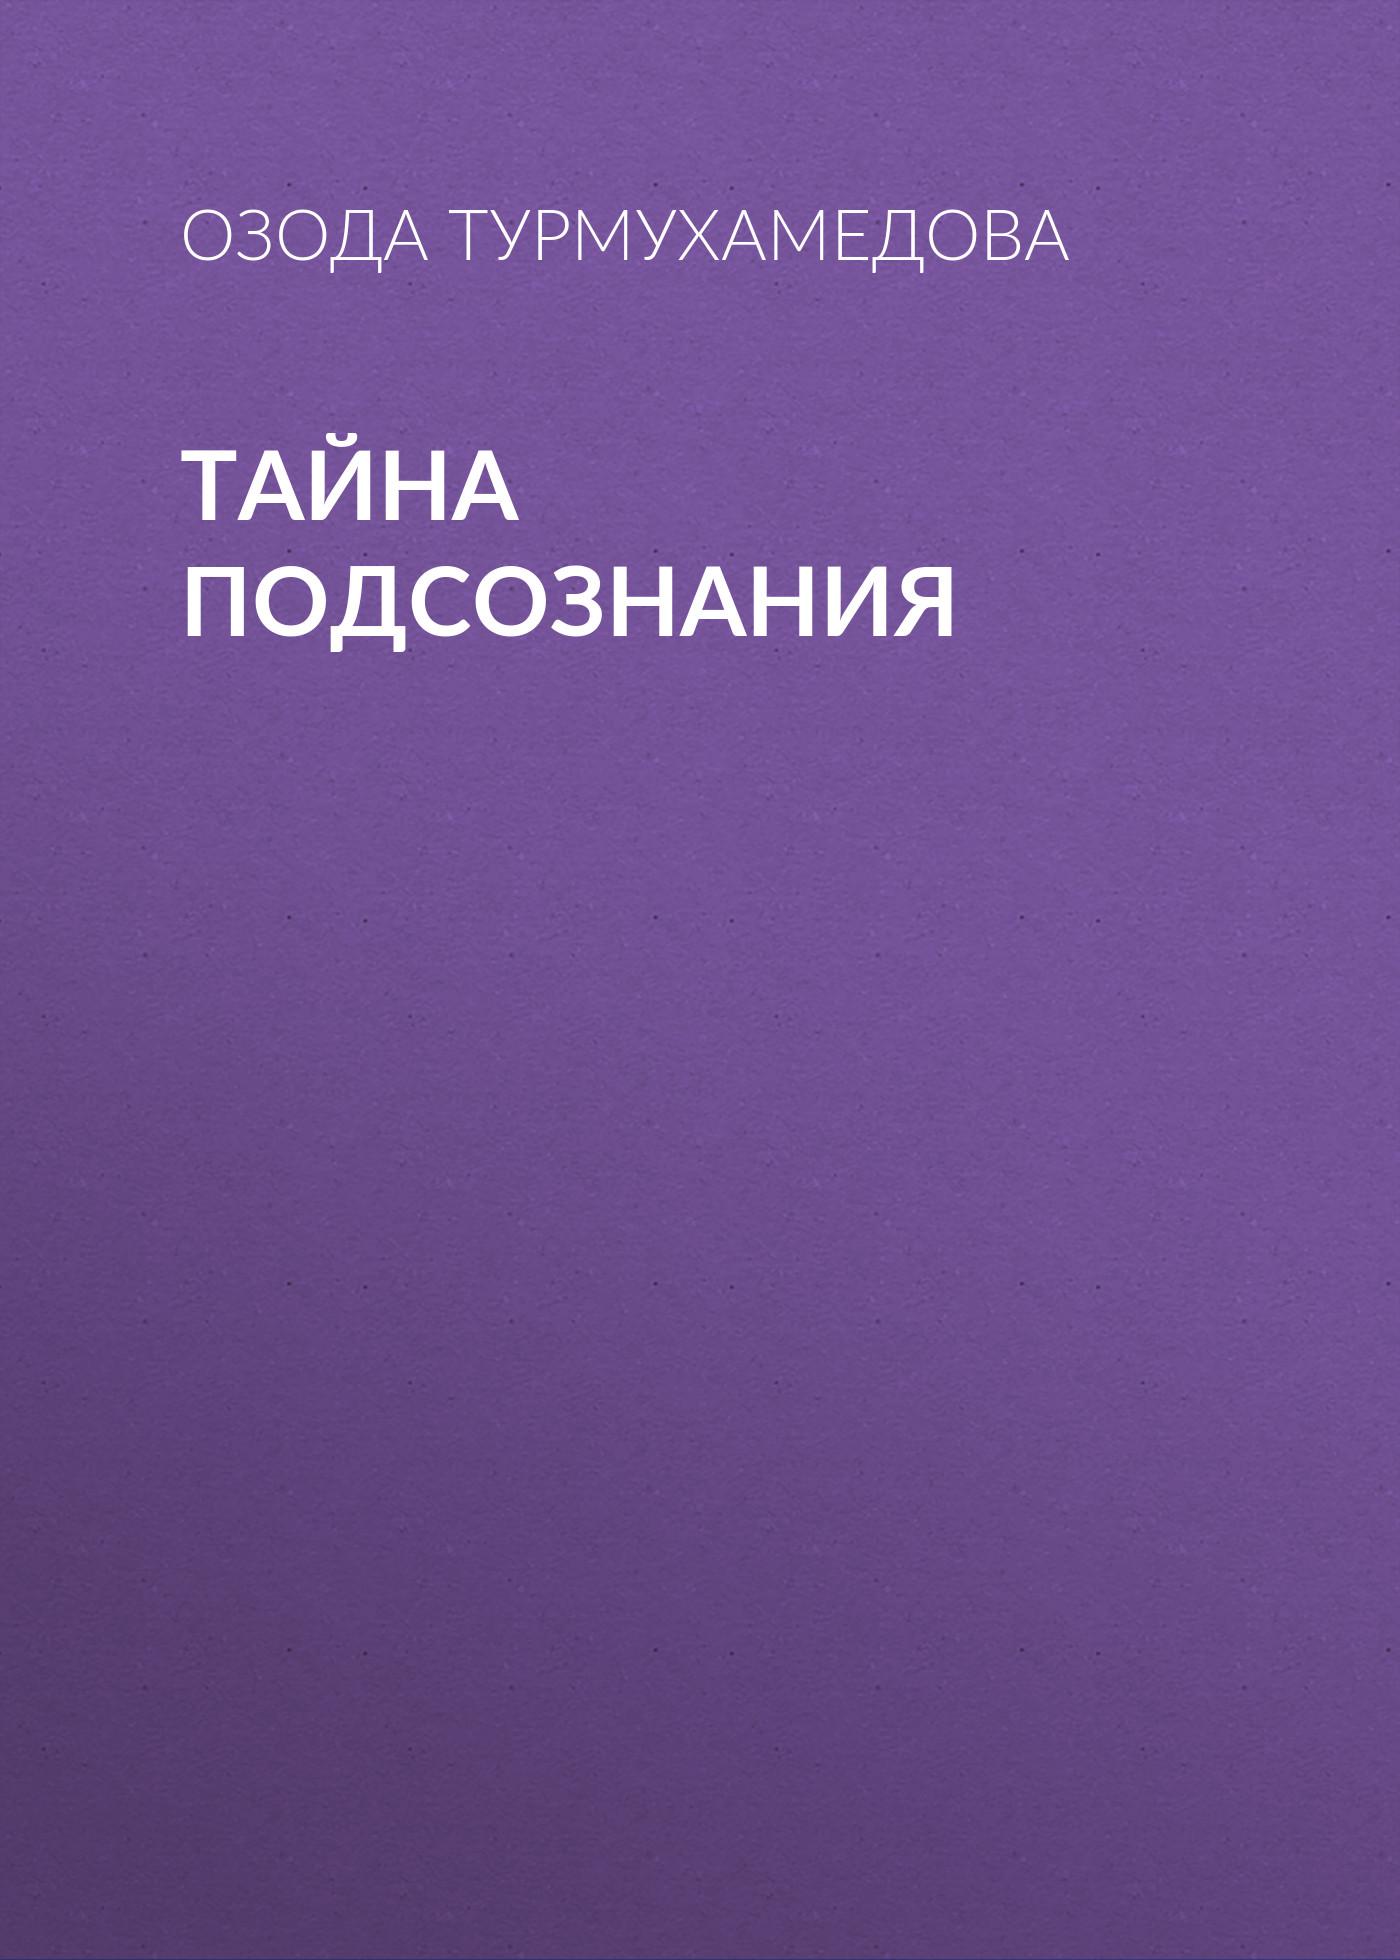 Тайна подсознания_Озода Турмухамедова